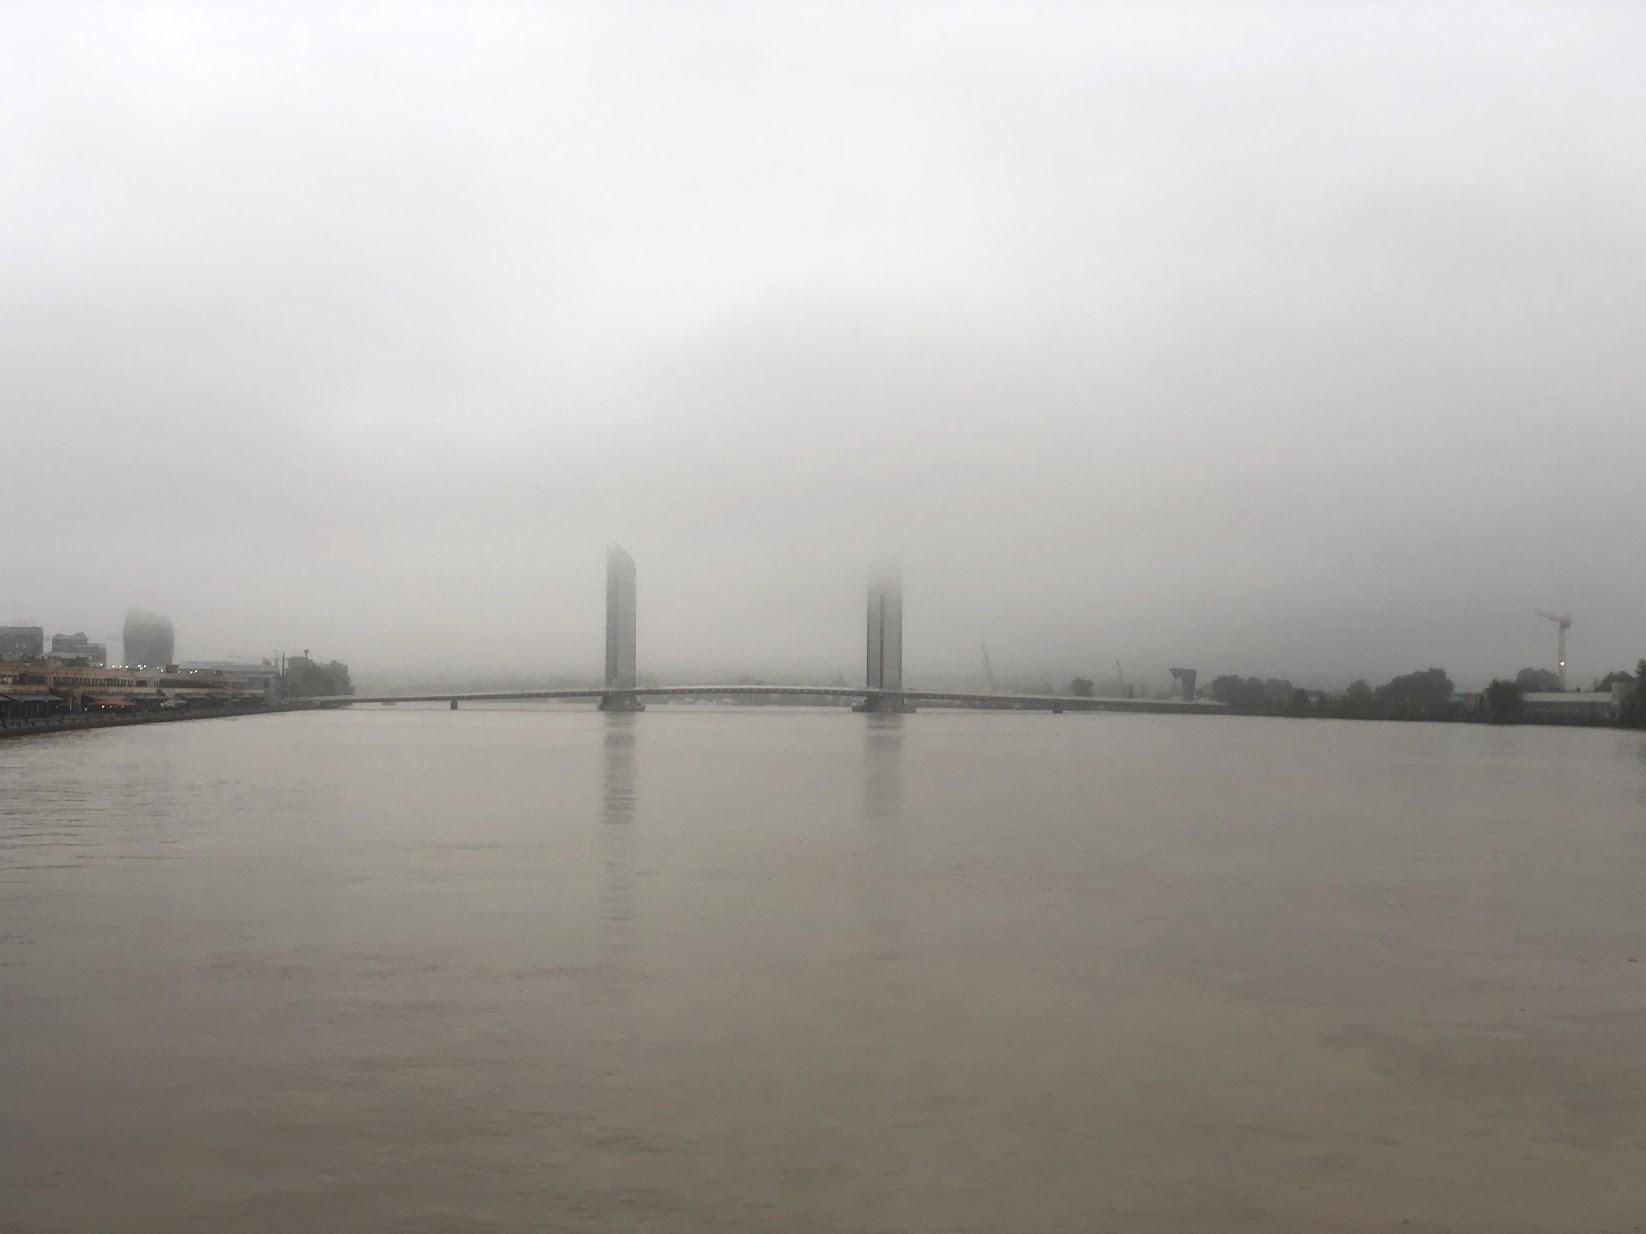 Bordeaux v hmle